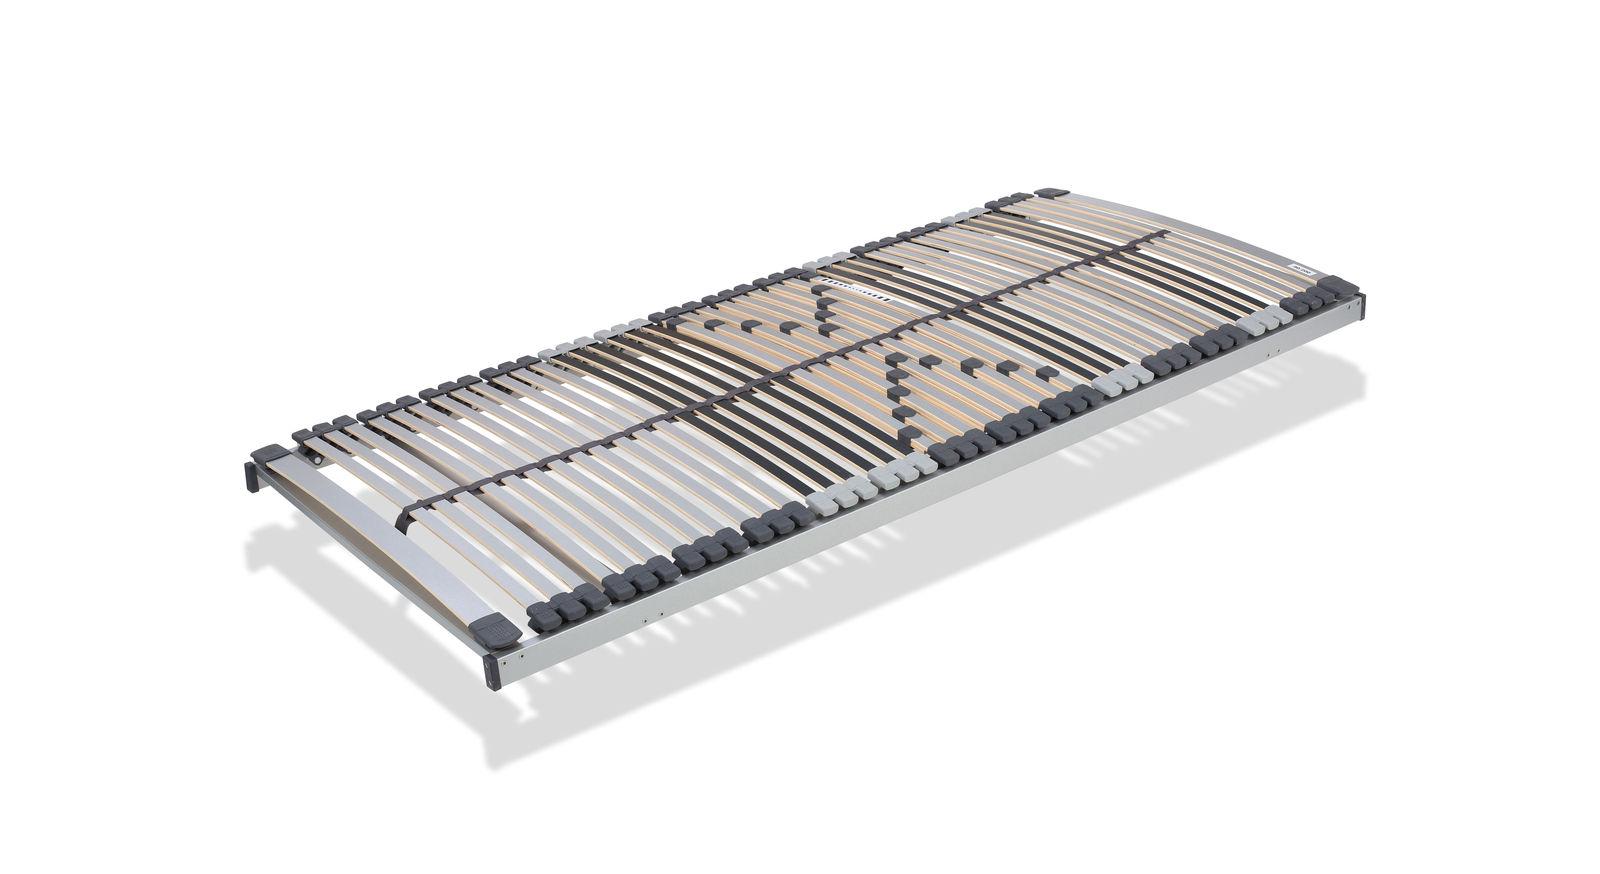 MALIE-Lattenrost Classic Superflex 42 ohne Verstellung